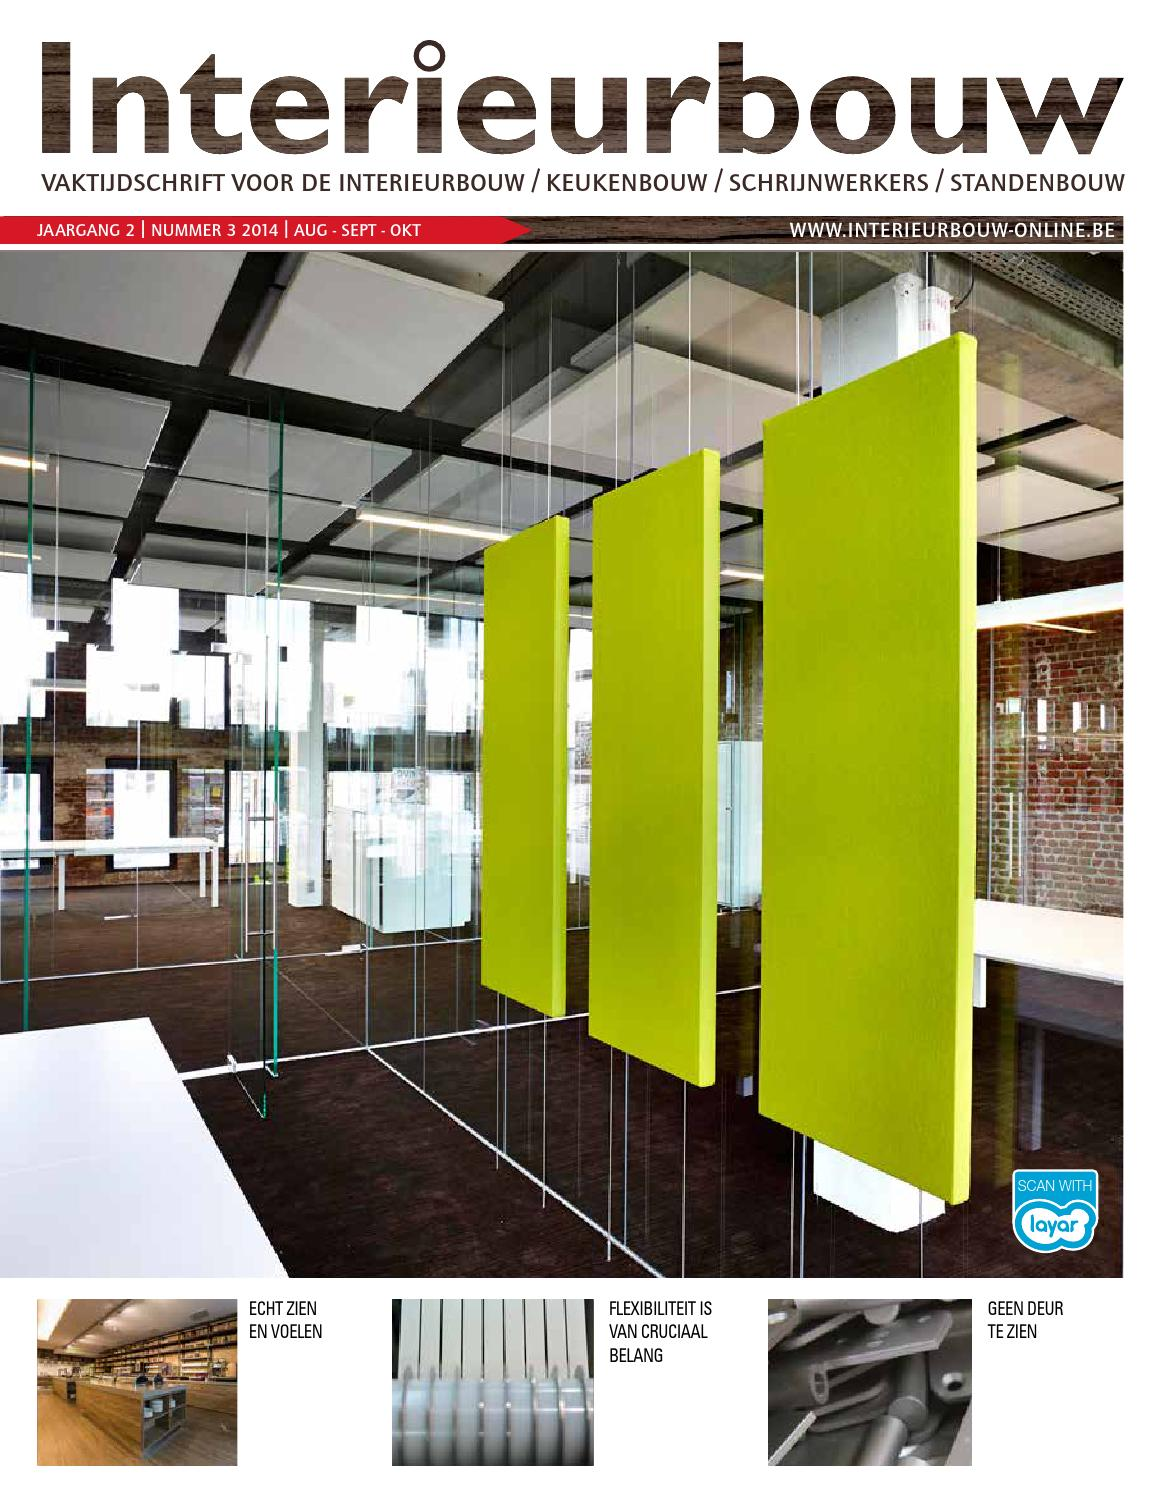 Interieurbouw 01 2016 by louwers uitgeversorganisatie bv   issuu